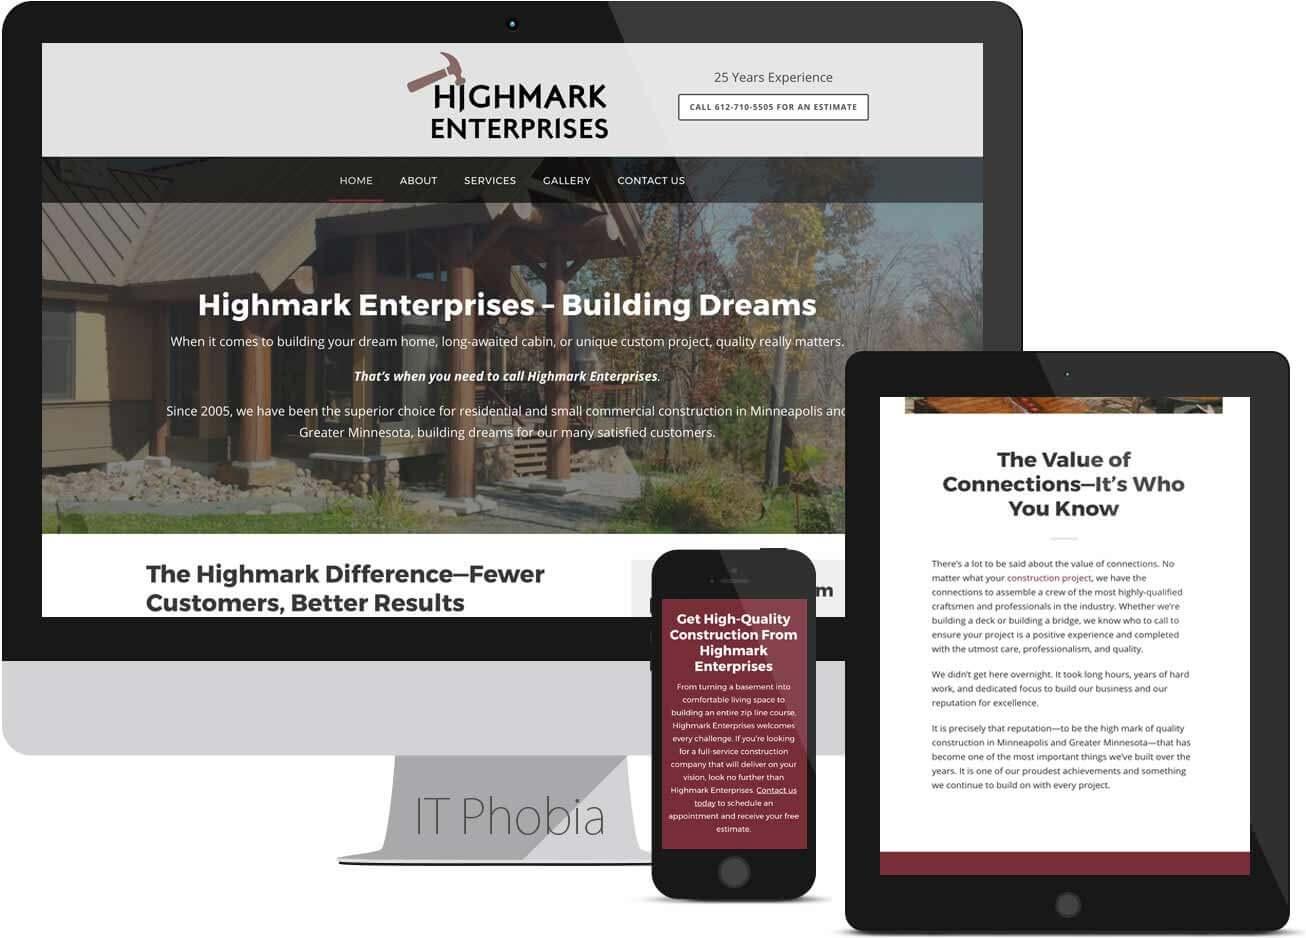 Highmark Enterprises